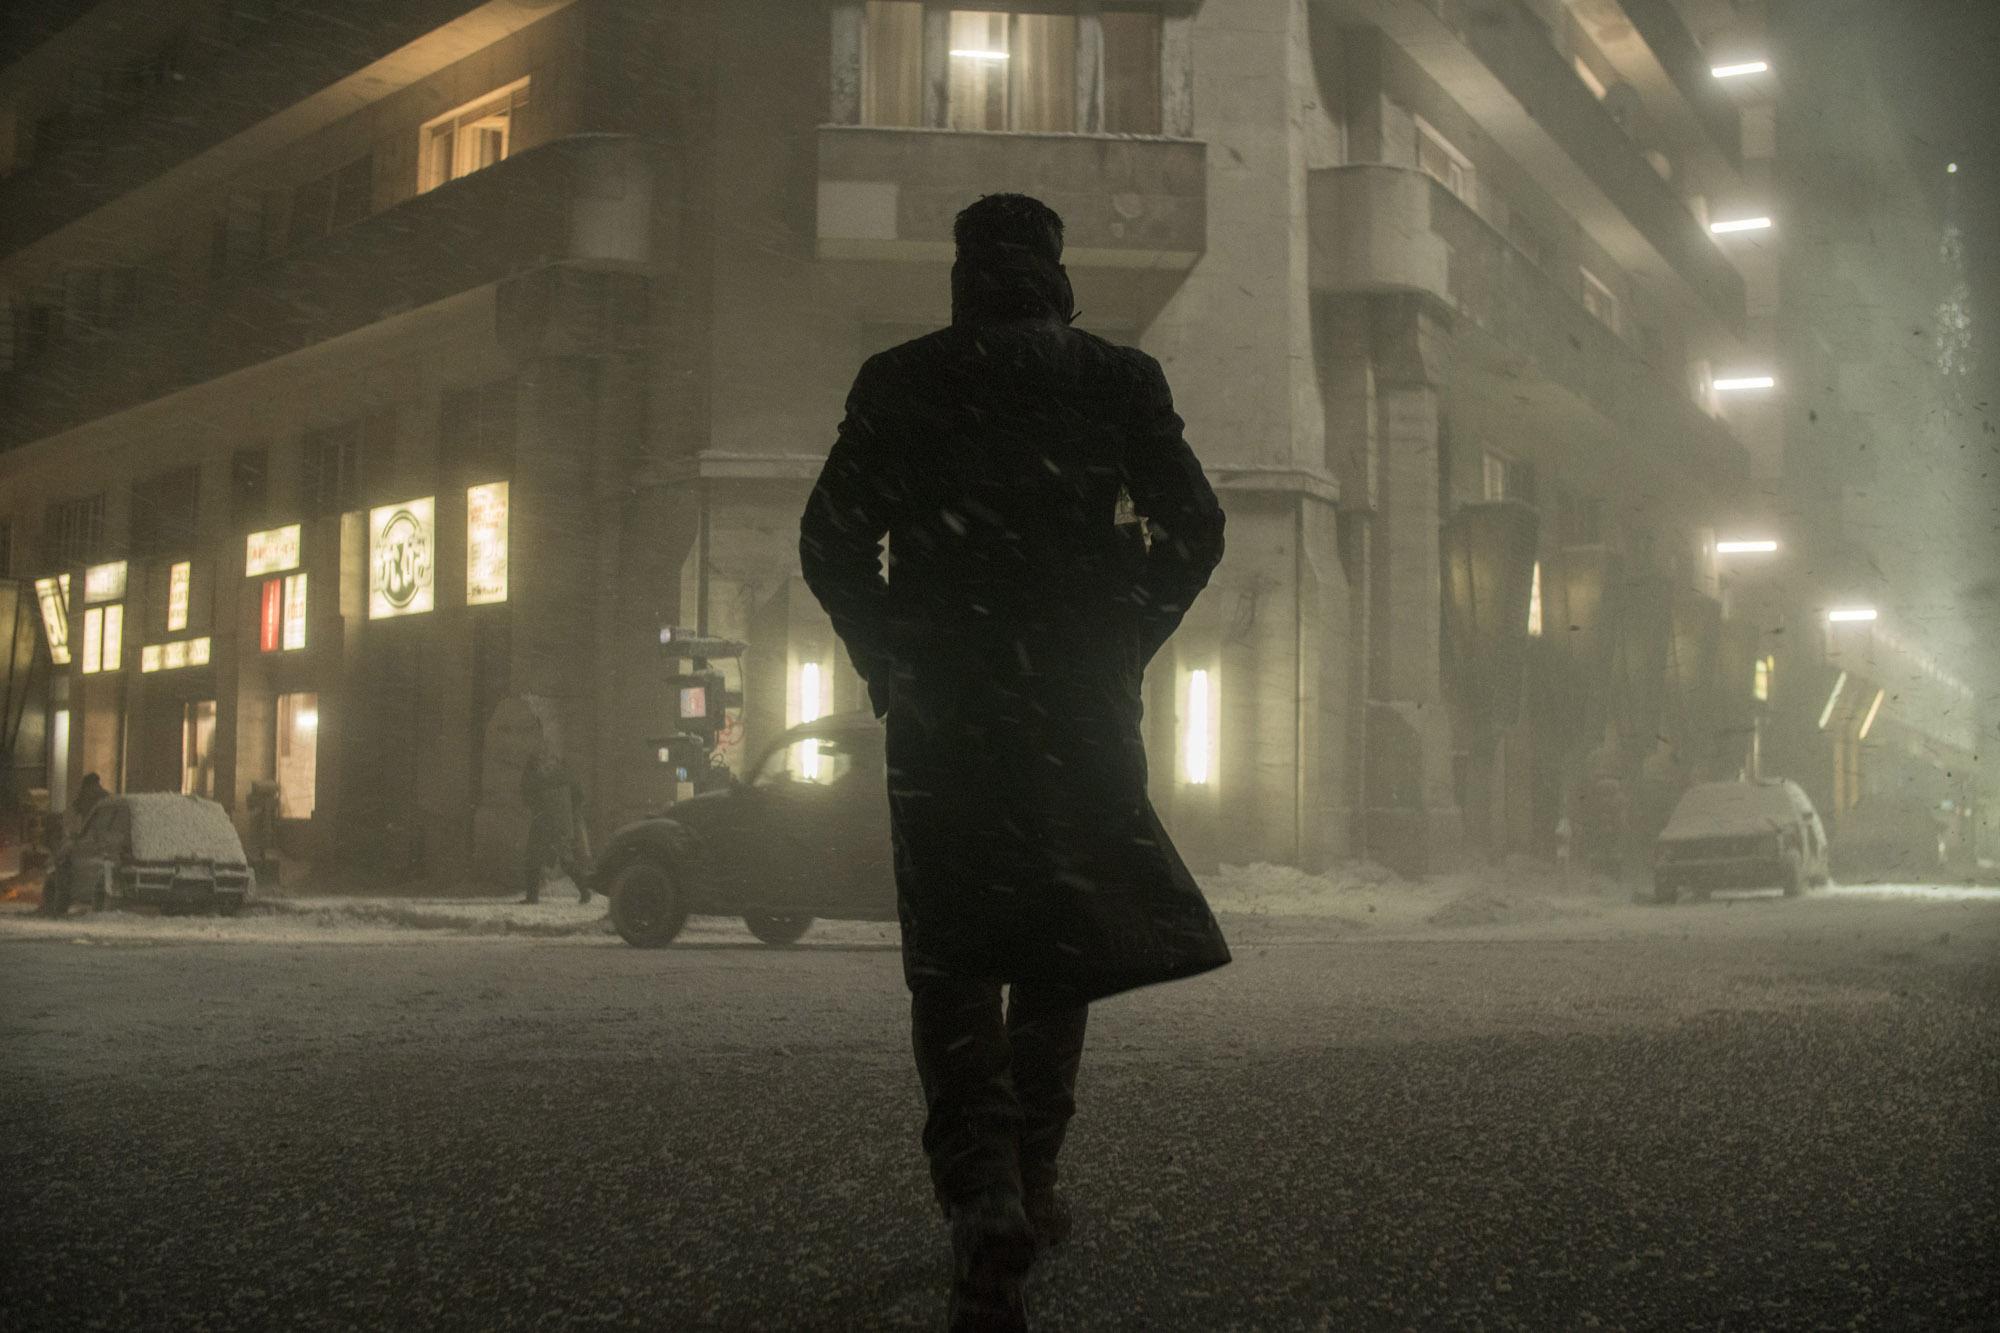 blade-runner-2049-image-ryan-gosling.jpg